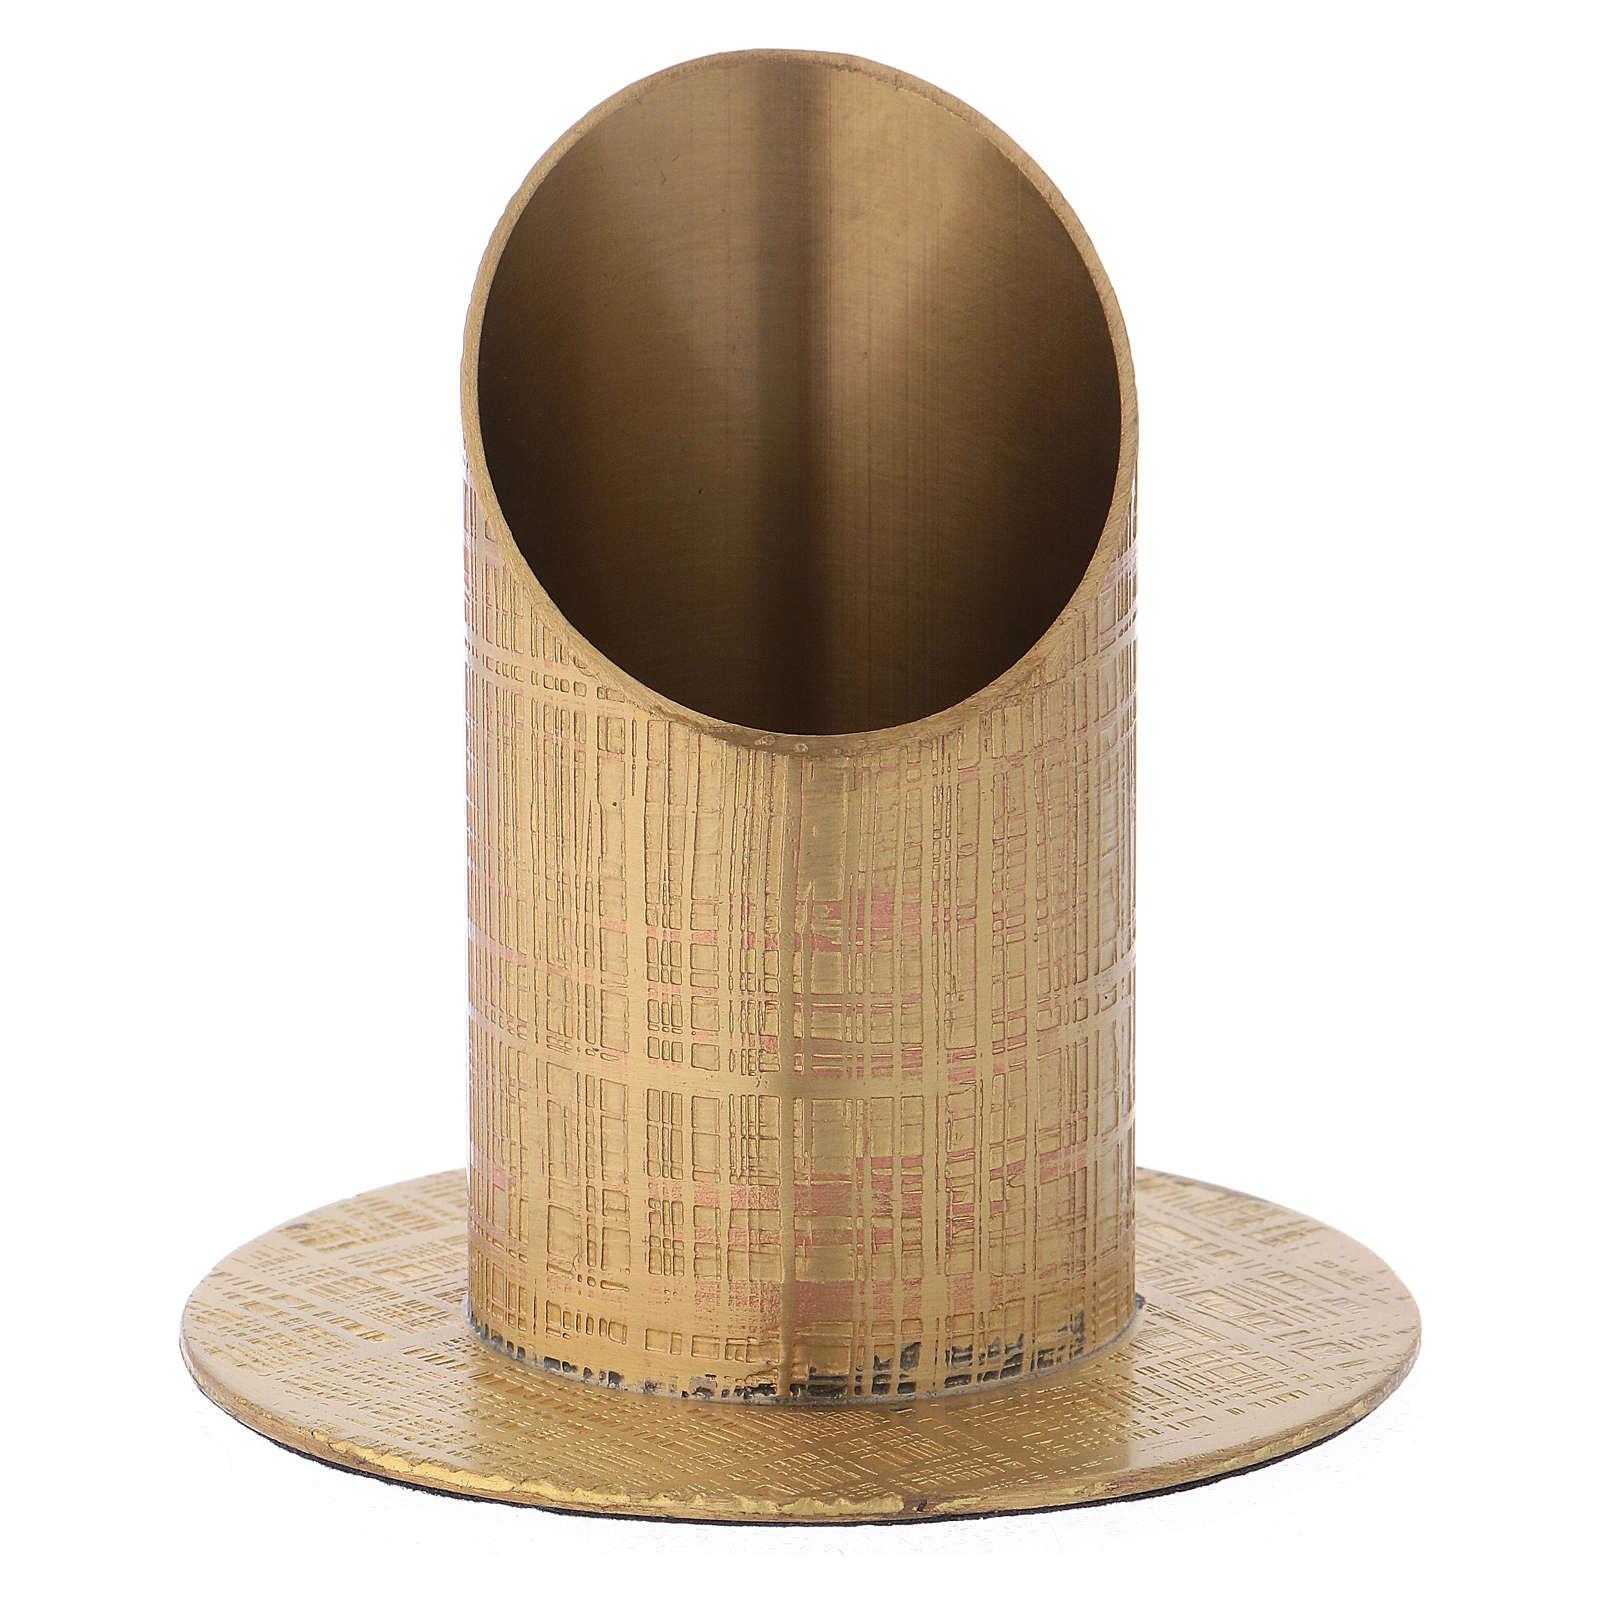 Portacandela ottone dorato superficie incisa 4